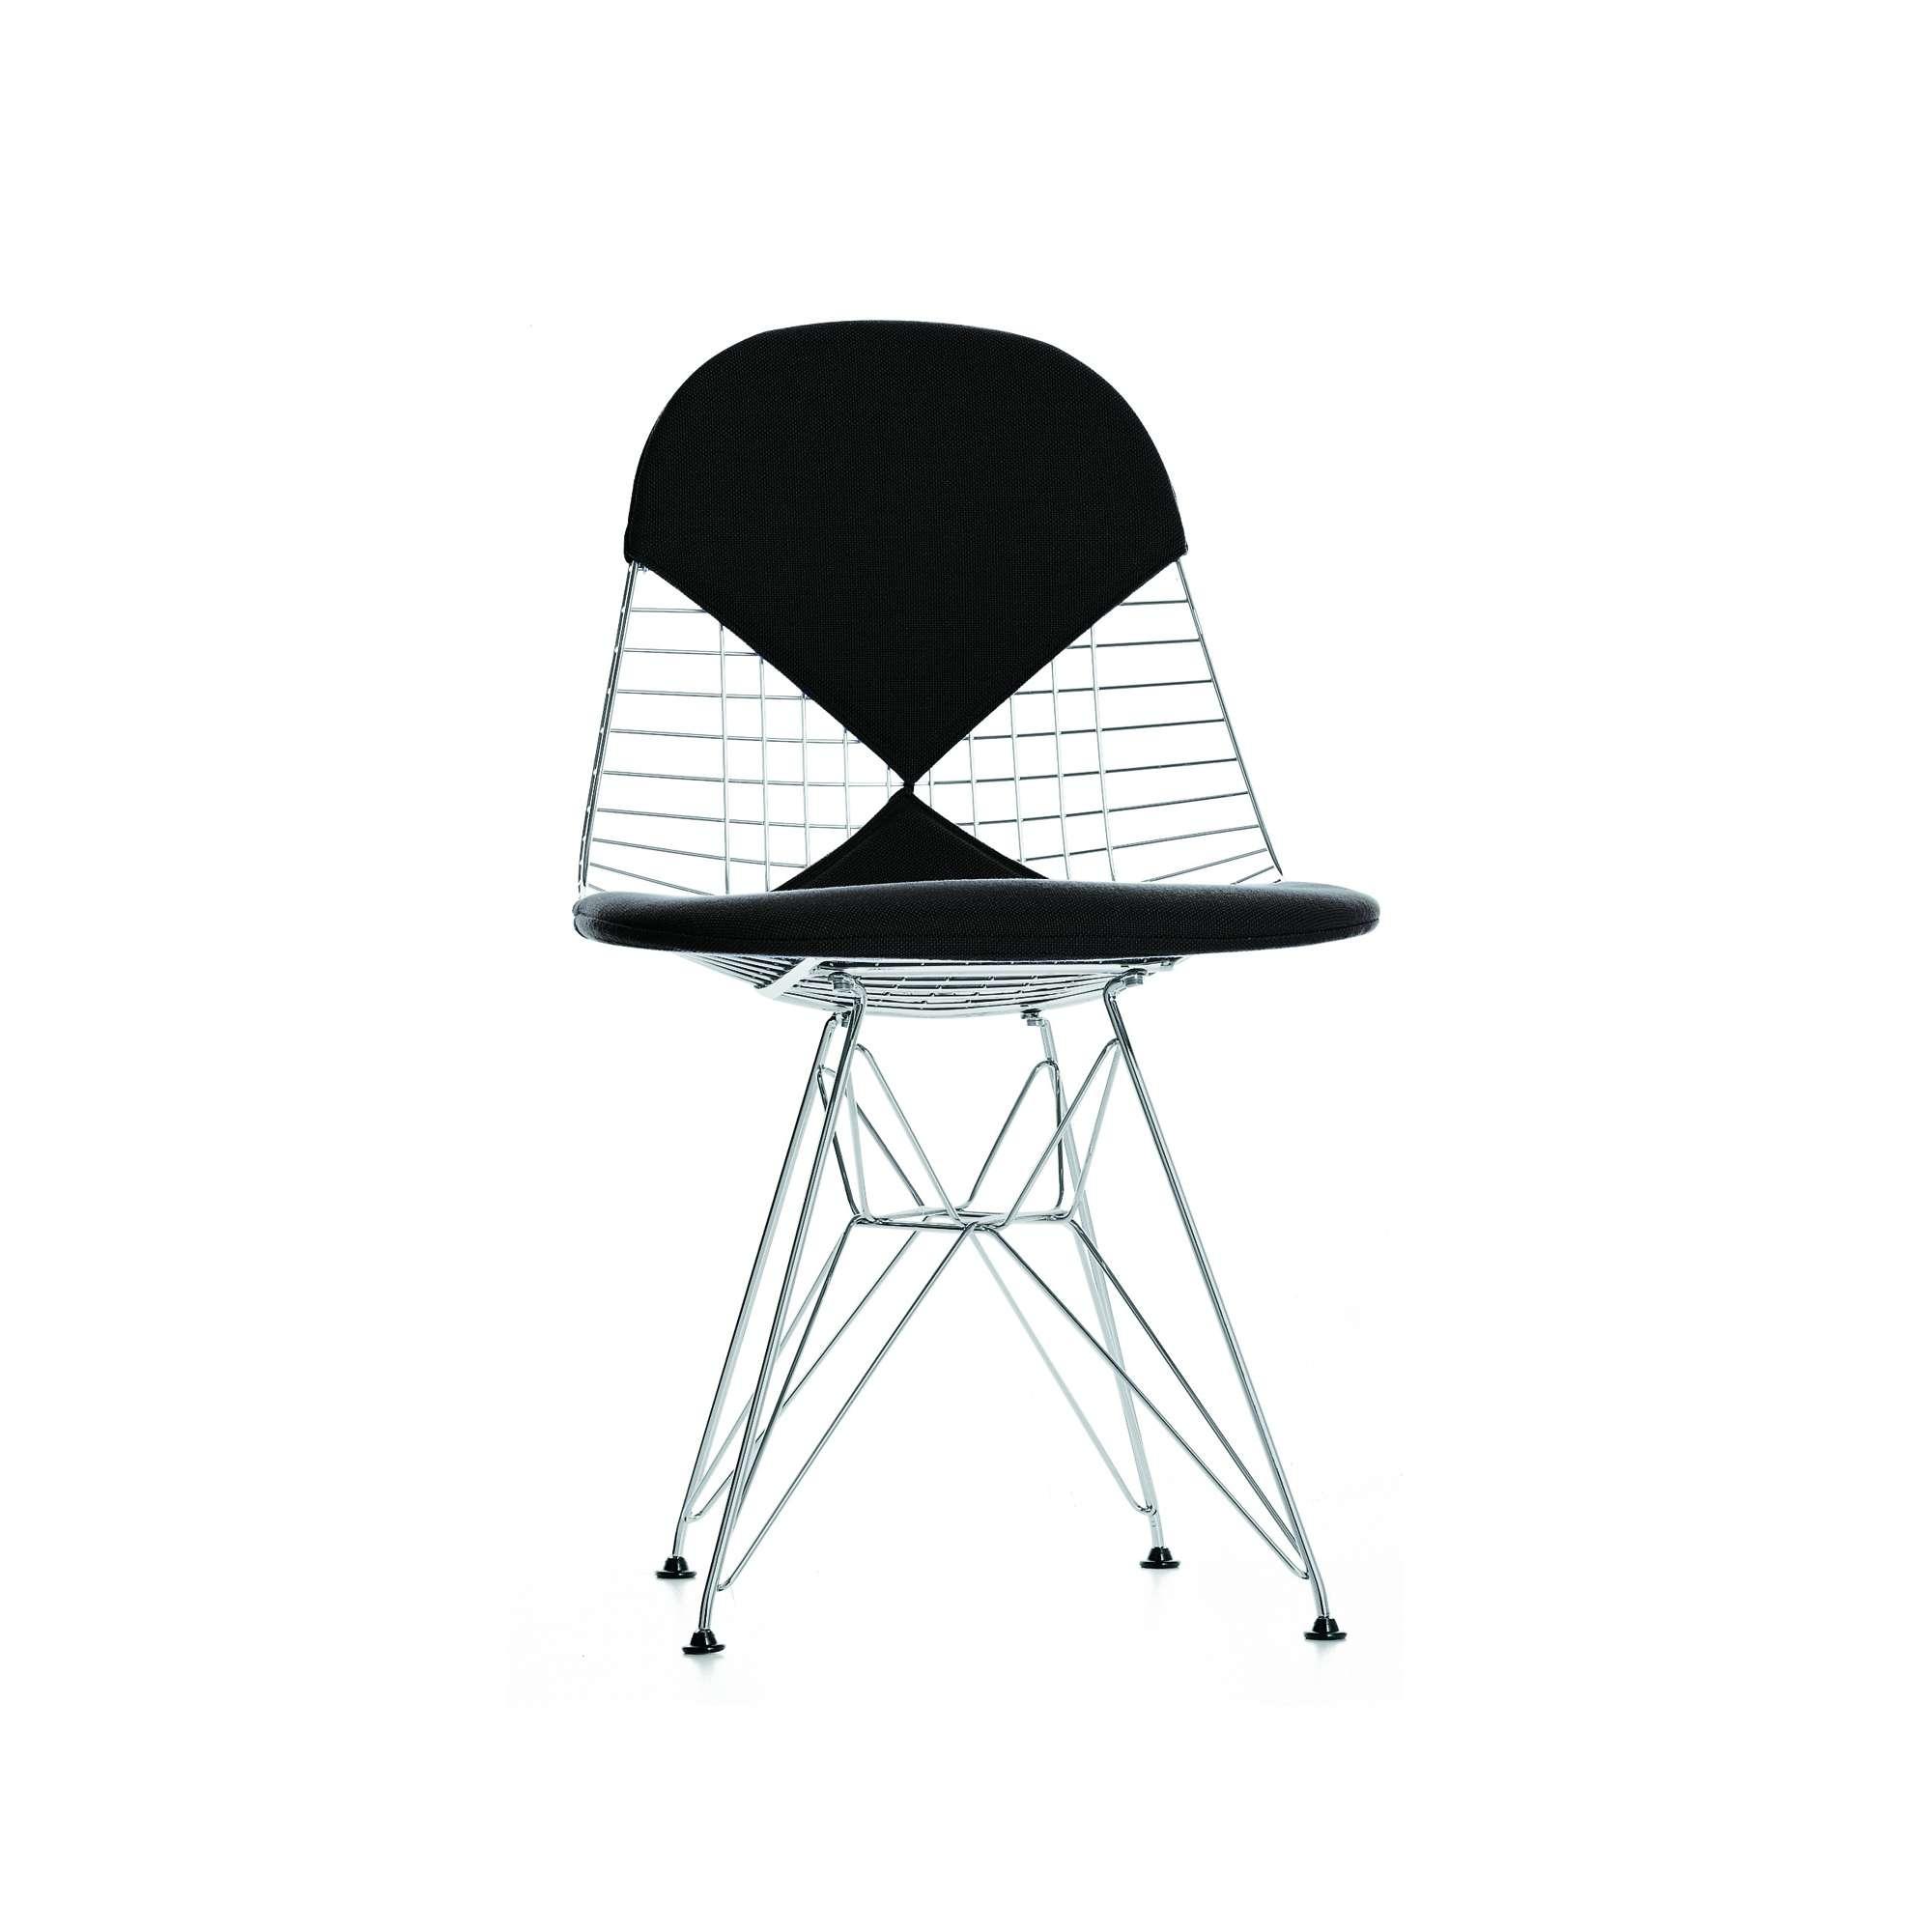 Vitra Stuhl Eames Wire Chair DKR Bikini Stoff oder Leder designikonen